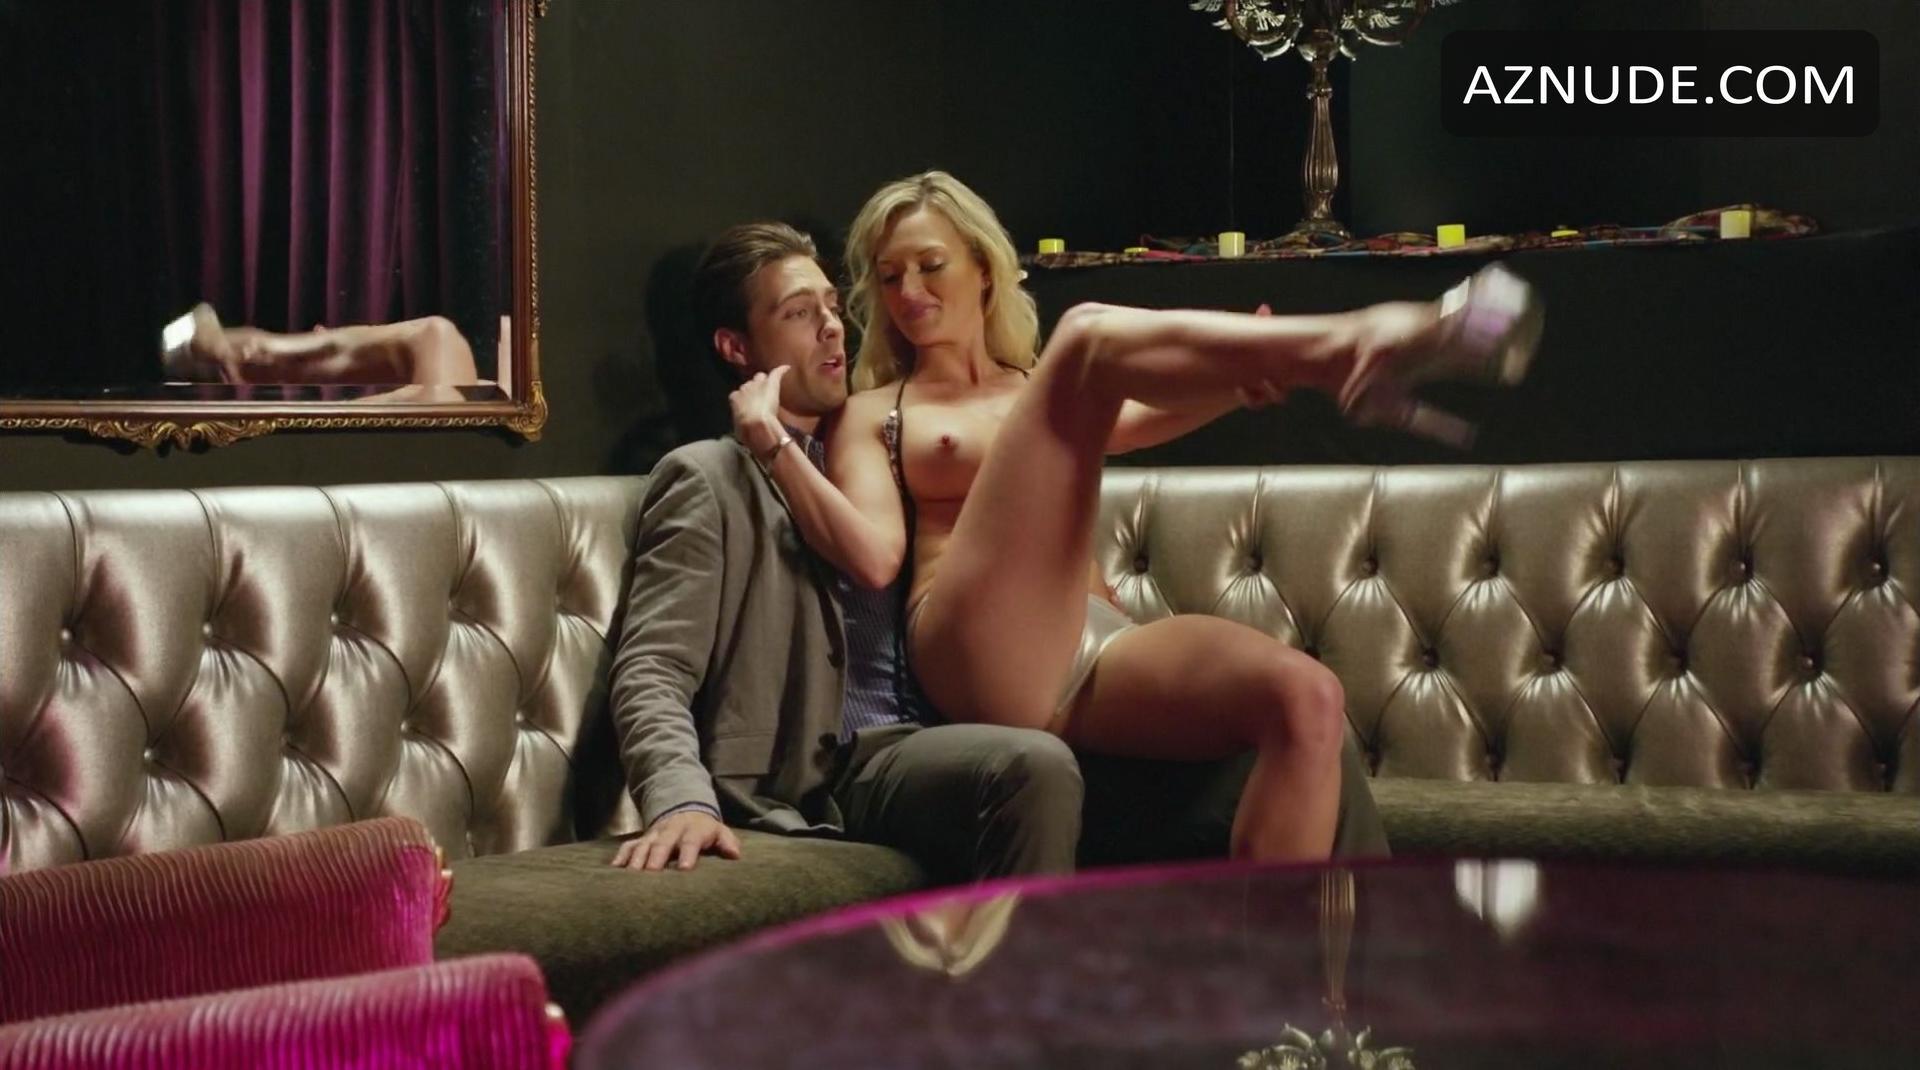 Megan albertus nude bachelor night 2014 Part 8